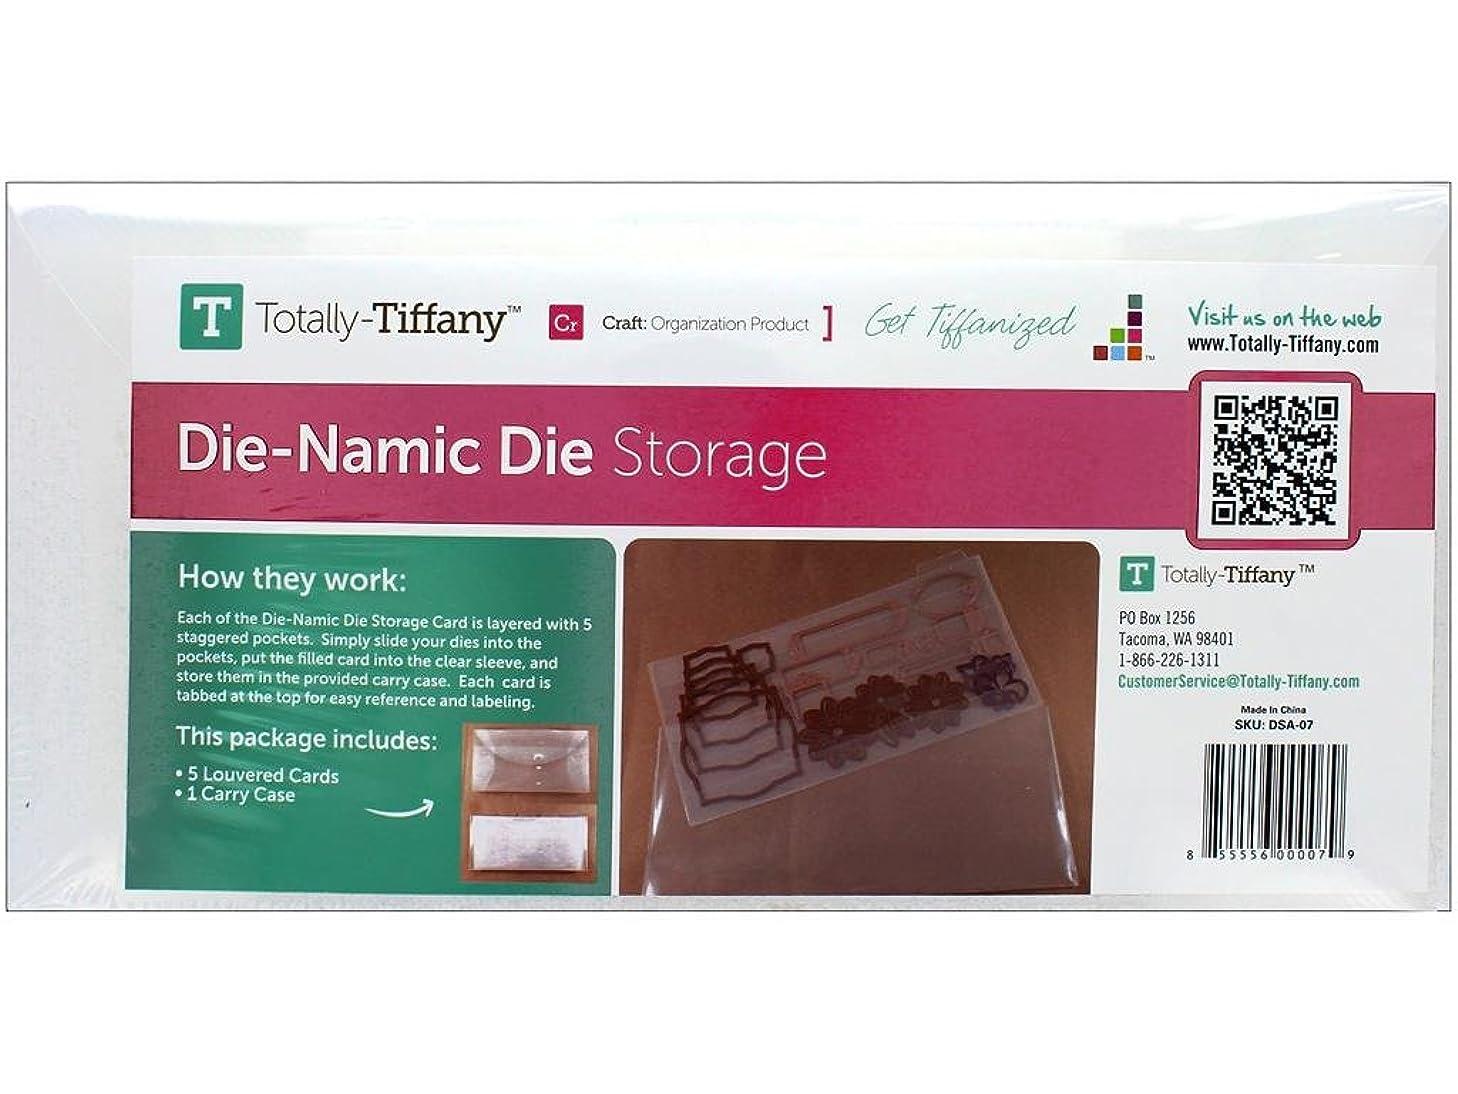 Totally-Tiffany Die-Namic Storage